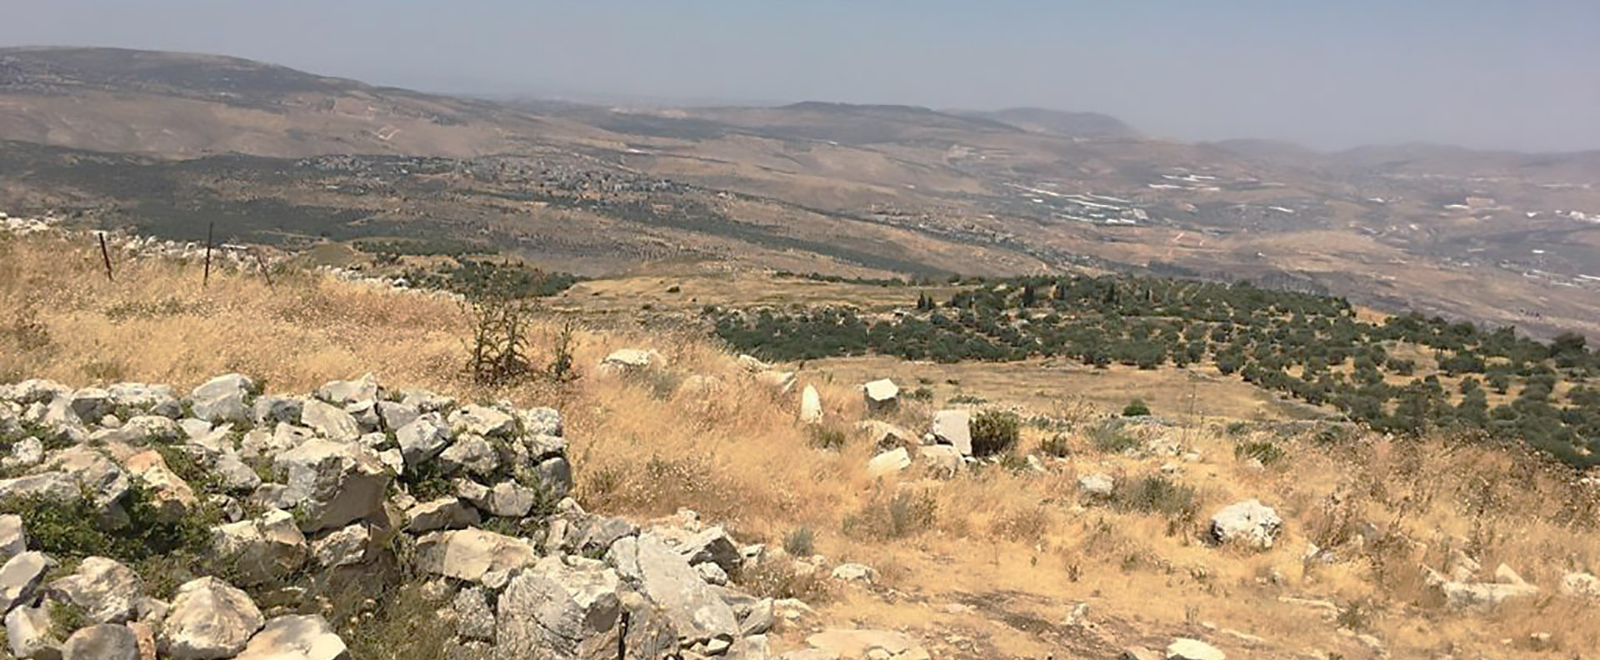 Visit Mount Ebal and Josephs Tomb